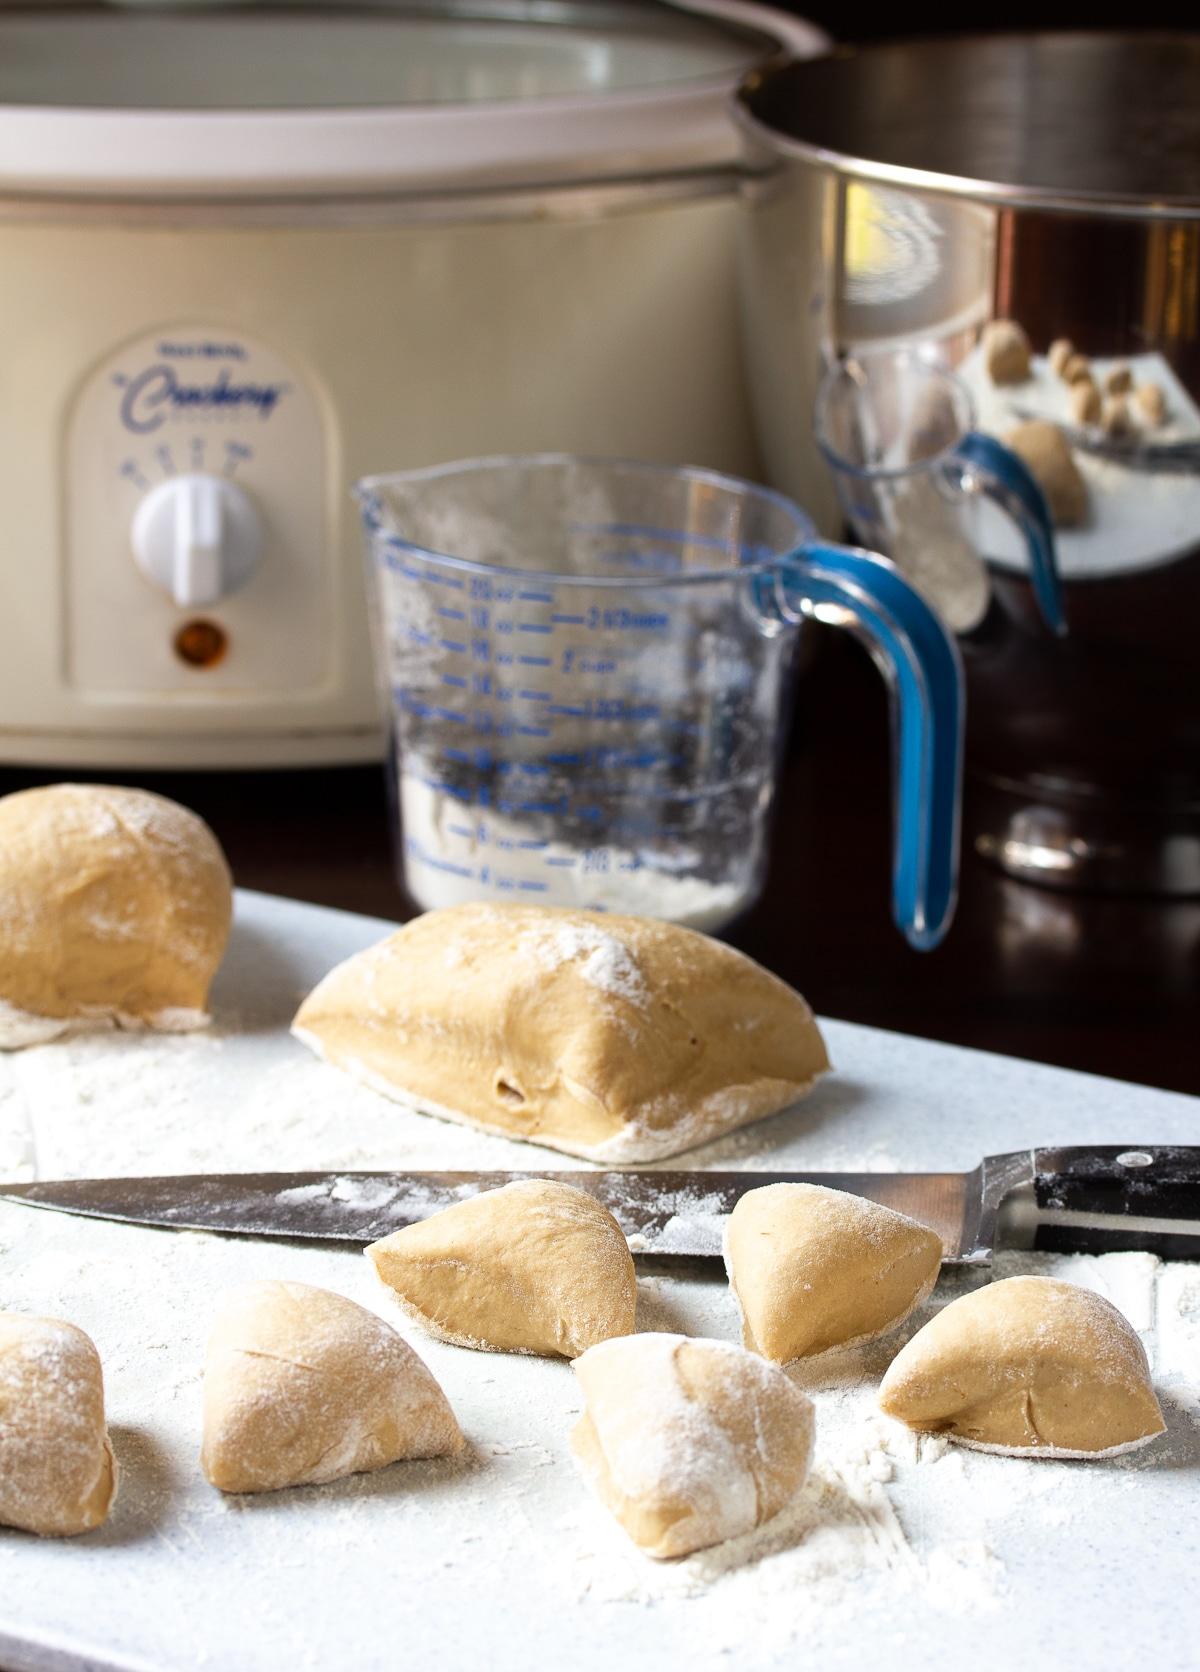 How To Make Crockpot Apple Butter Yeast Rolls Recipe #ASpicyPerspective #crockpot #slowcooker #thanksgiving #recipes #rolls #bread